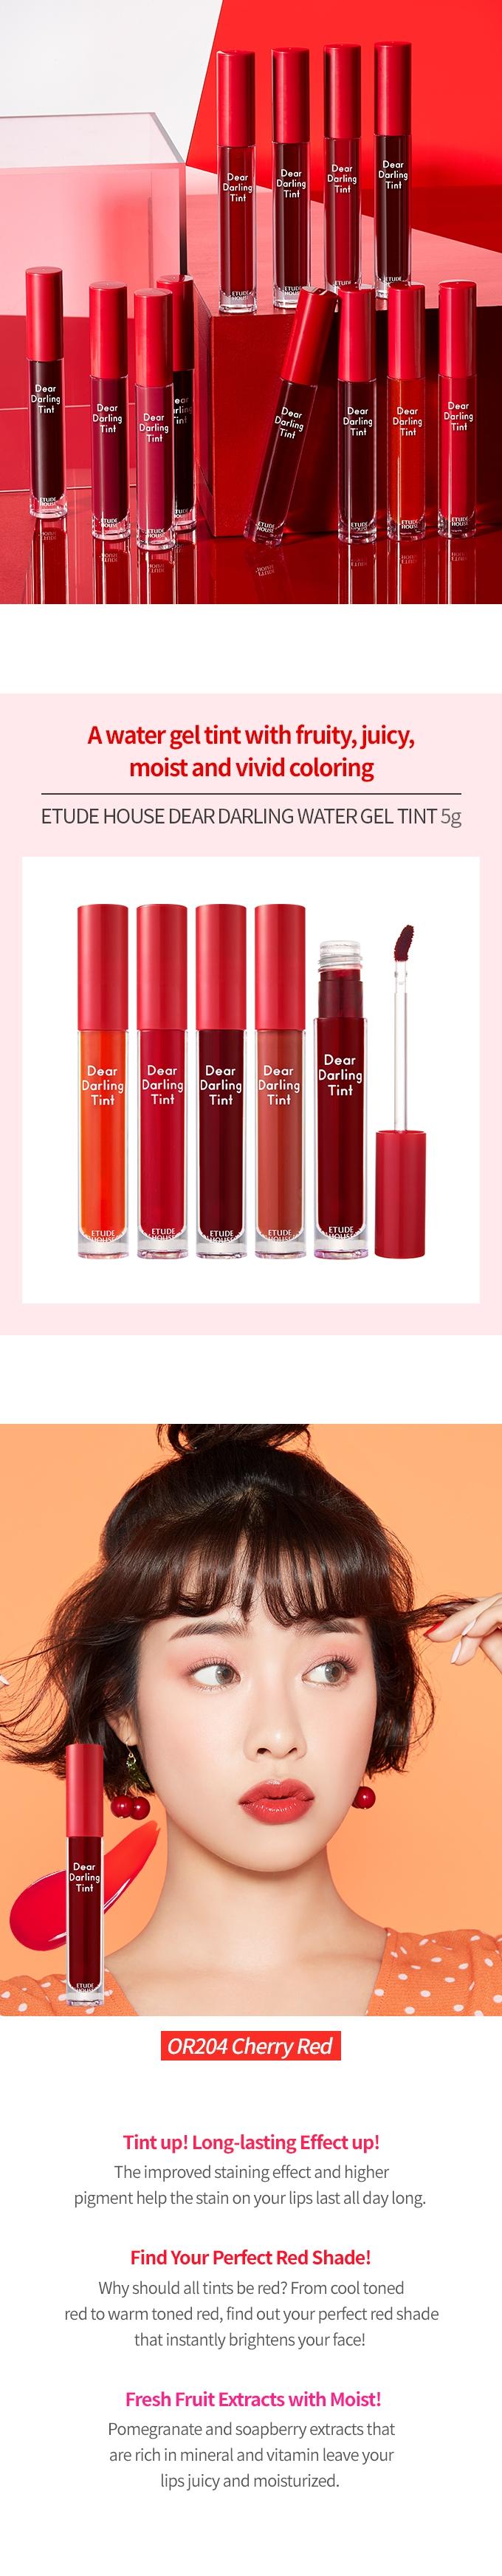 Dear Darling Water Gel Tint #OR201 Kumquat Red